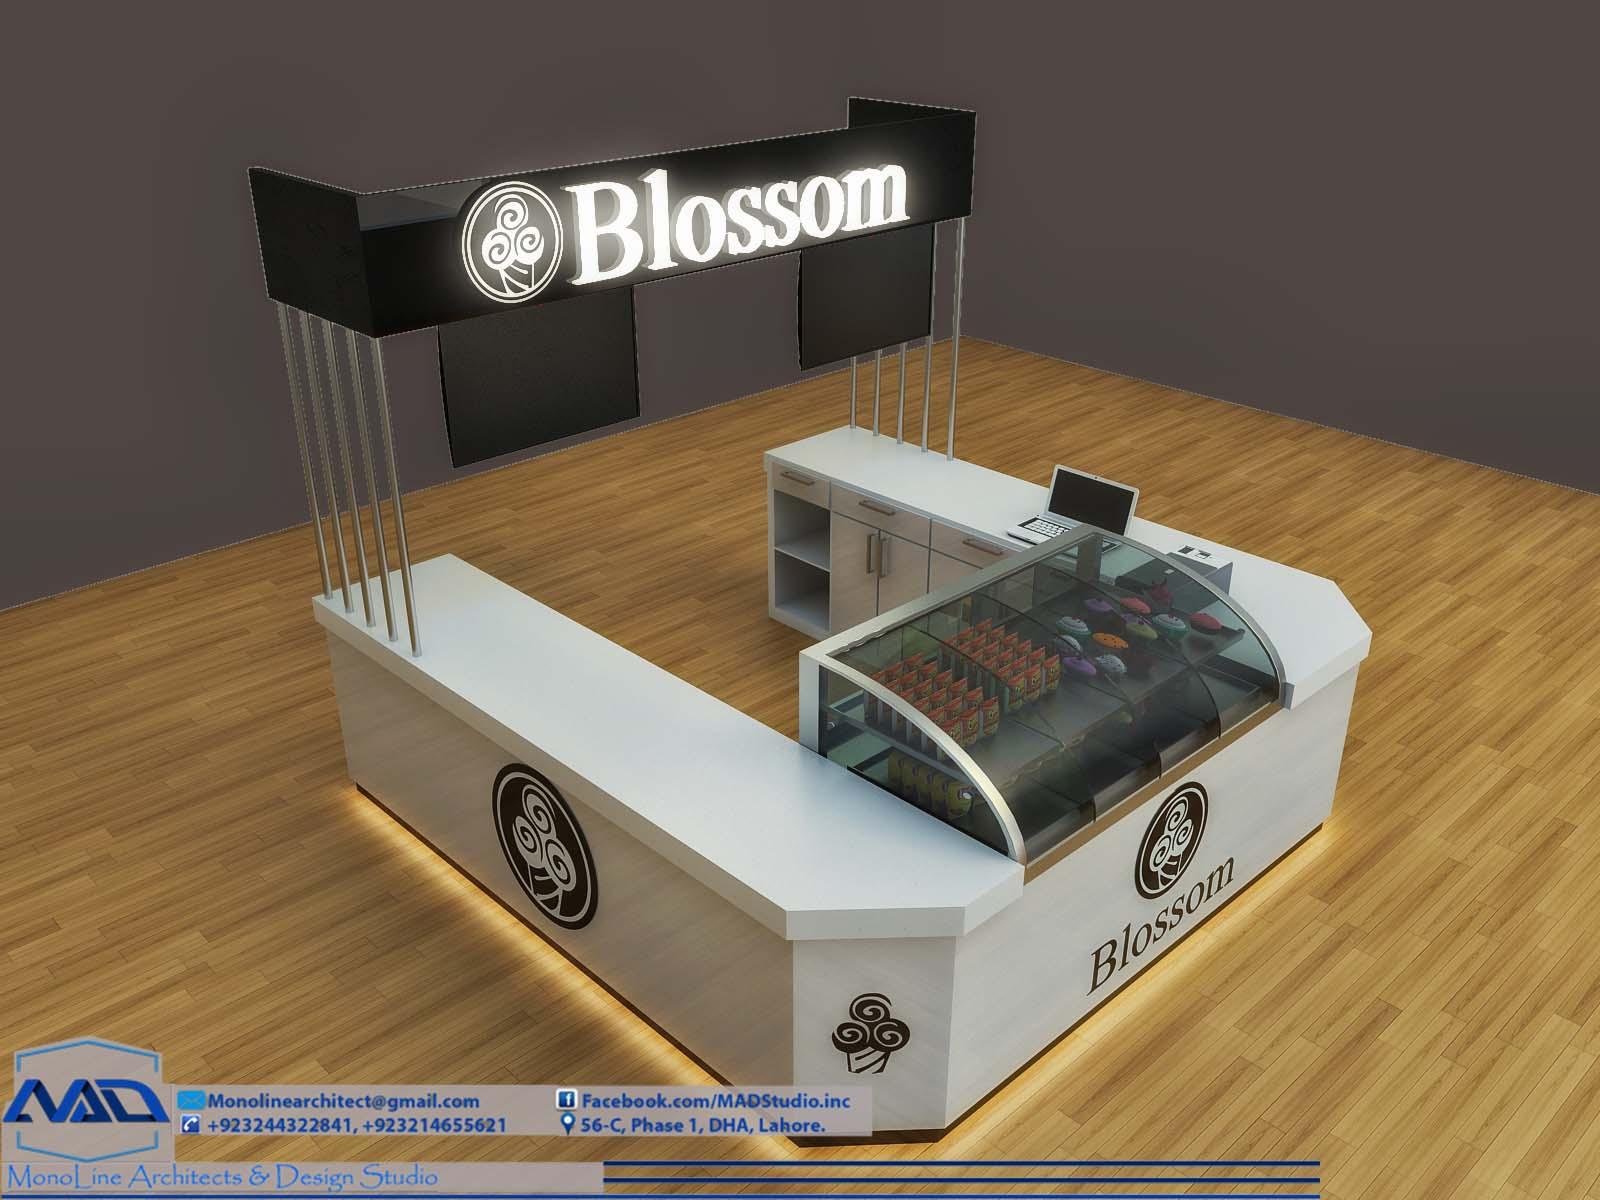 Blossom Kiosk